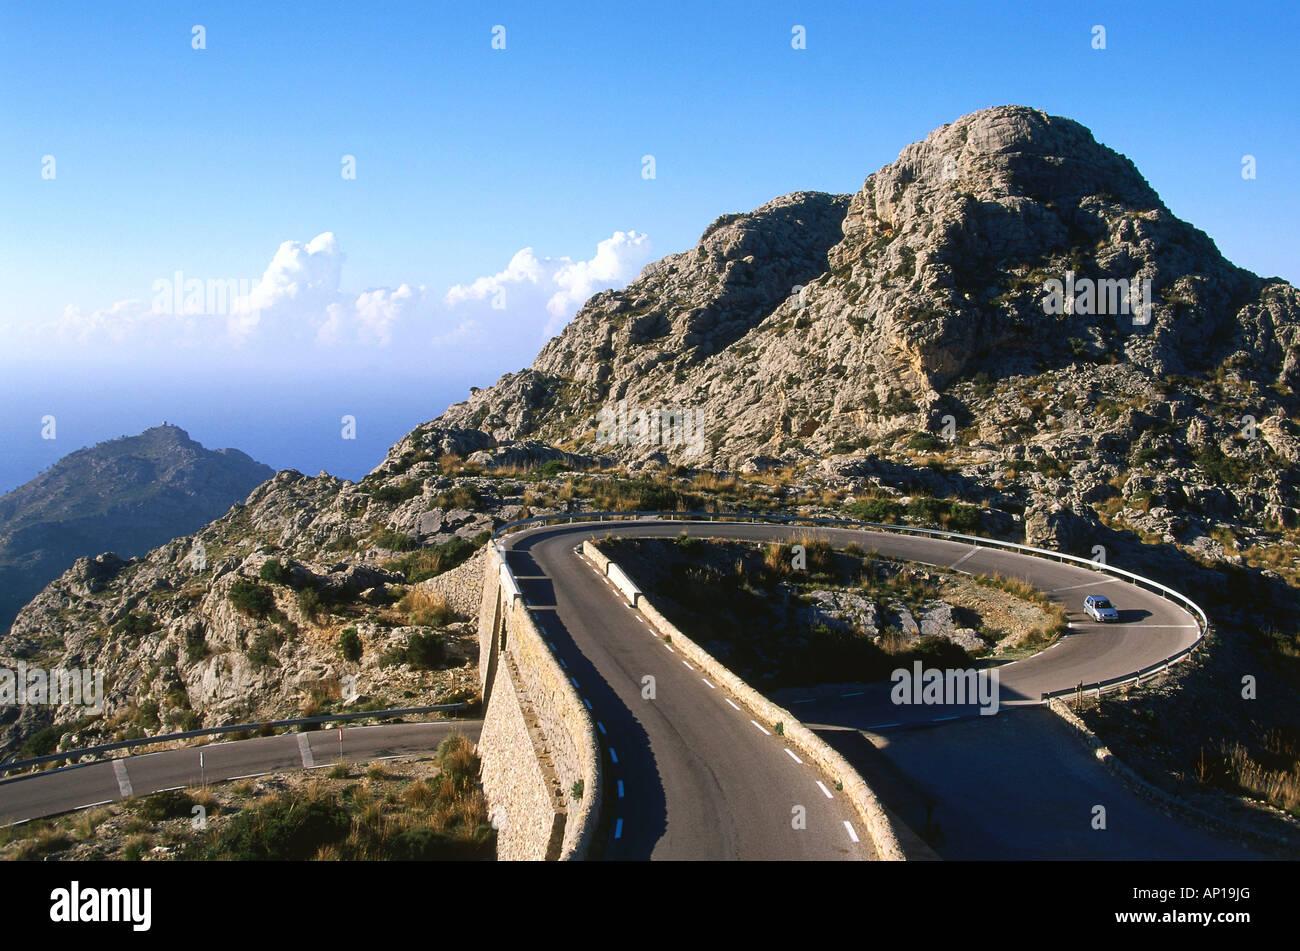 Road to Sa Calobra, known as the tie knot, Serra de Tramuntana, Mallorca, Spain - Stock Image